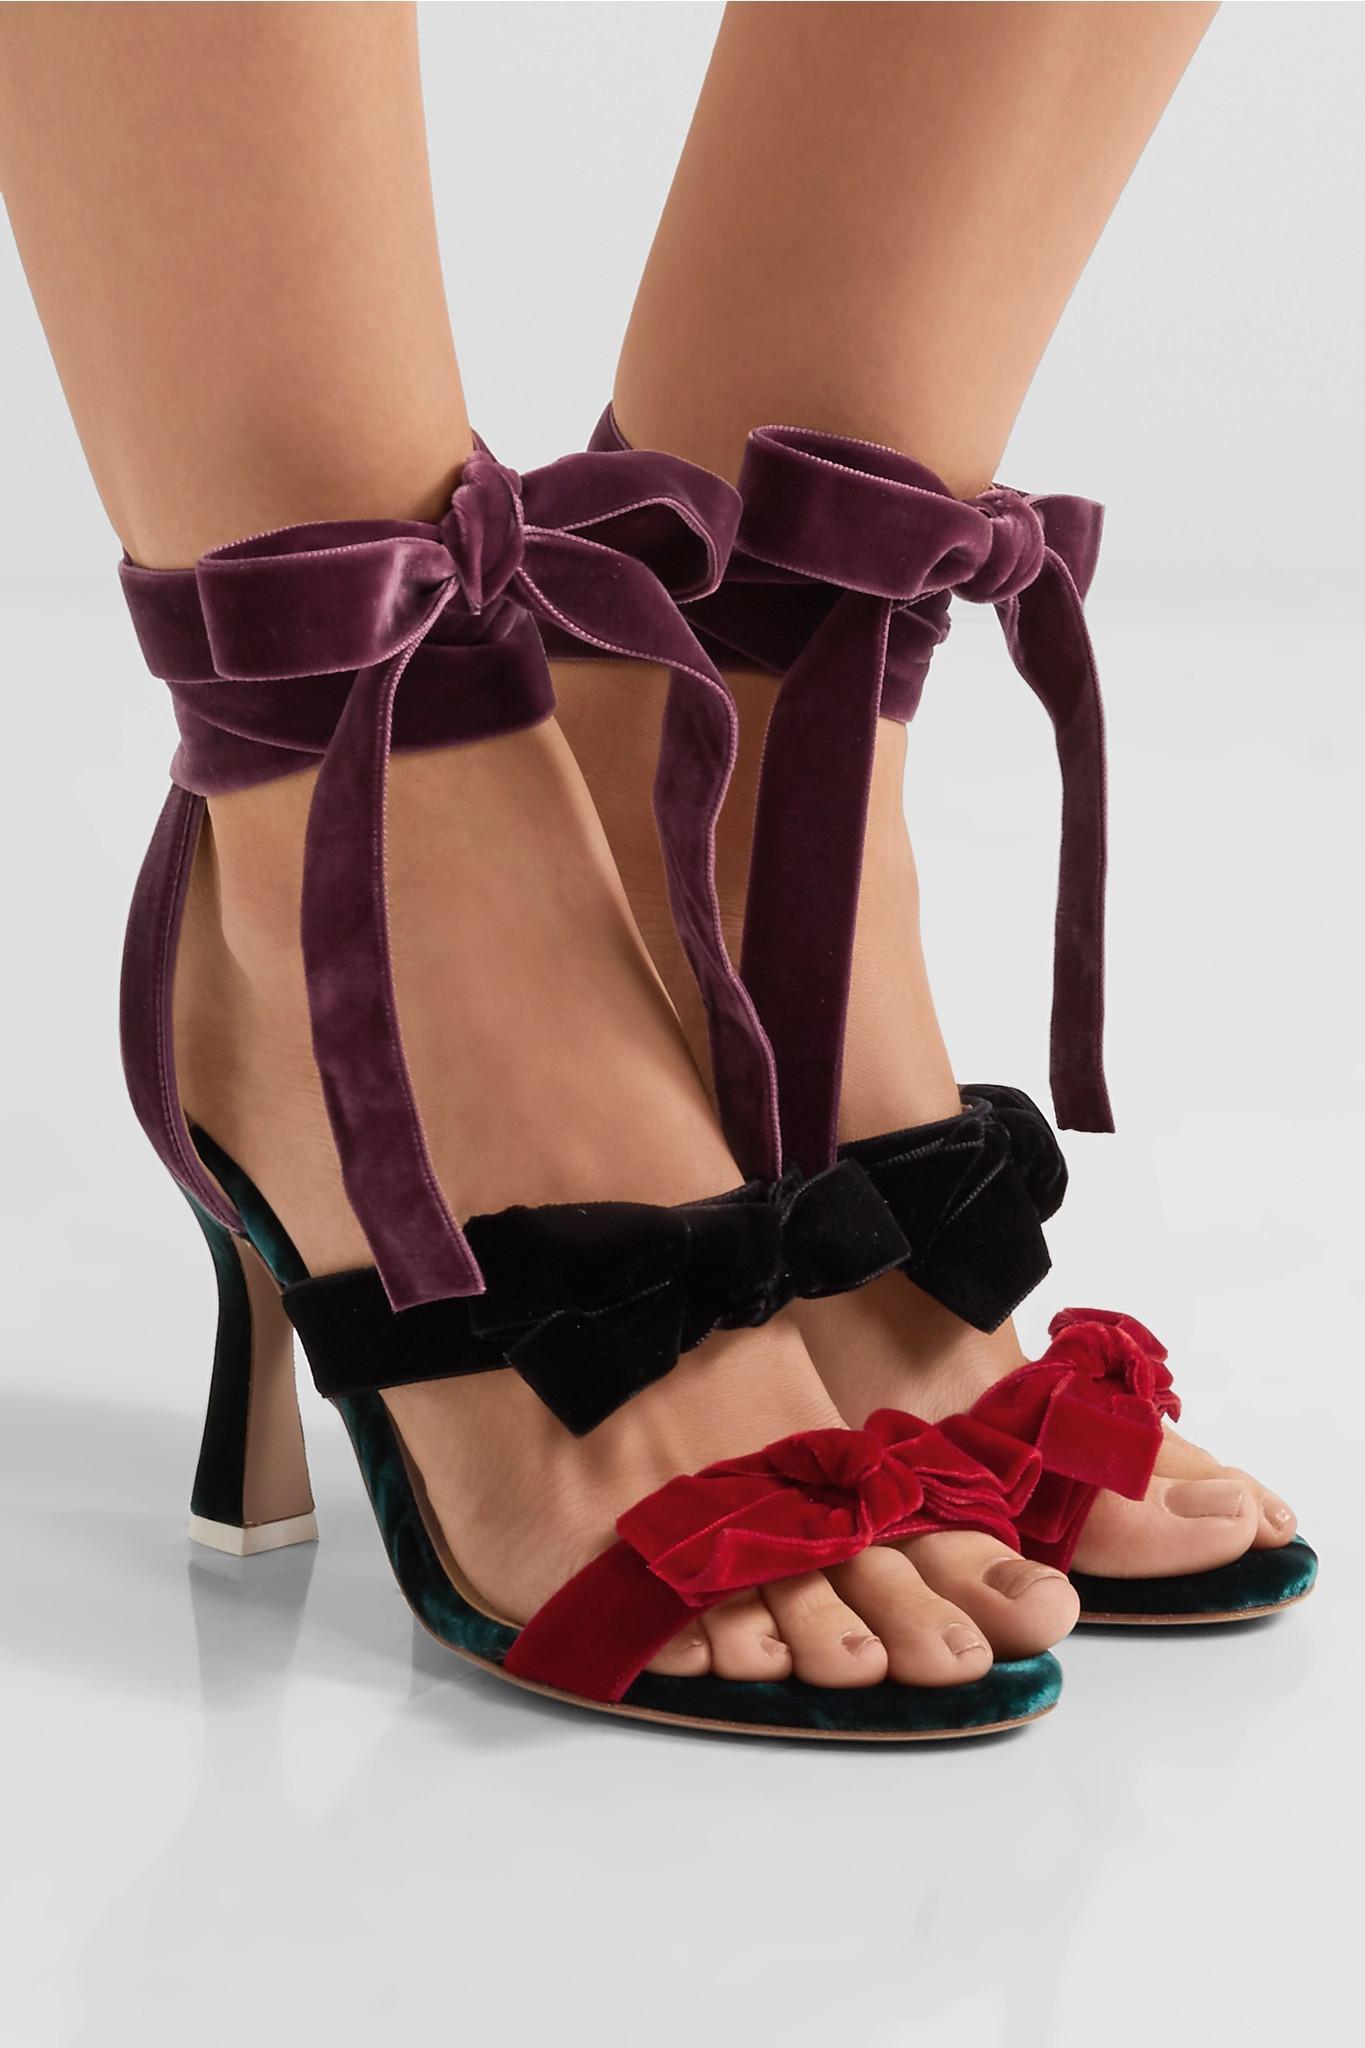 ATTICO Velvet Diletta Sandals in . nJ1fEwJ6P4